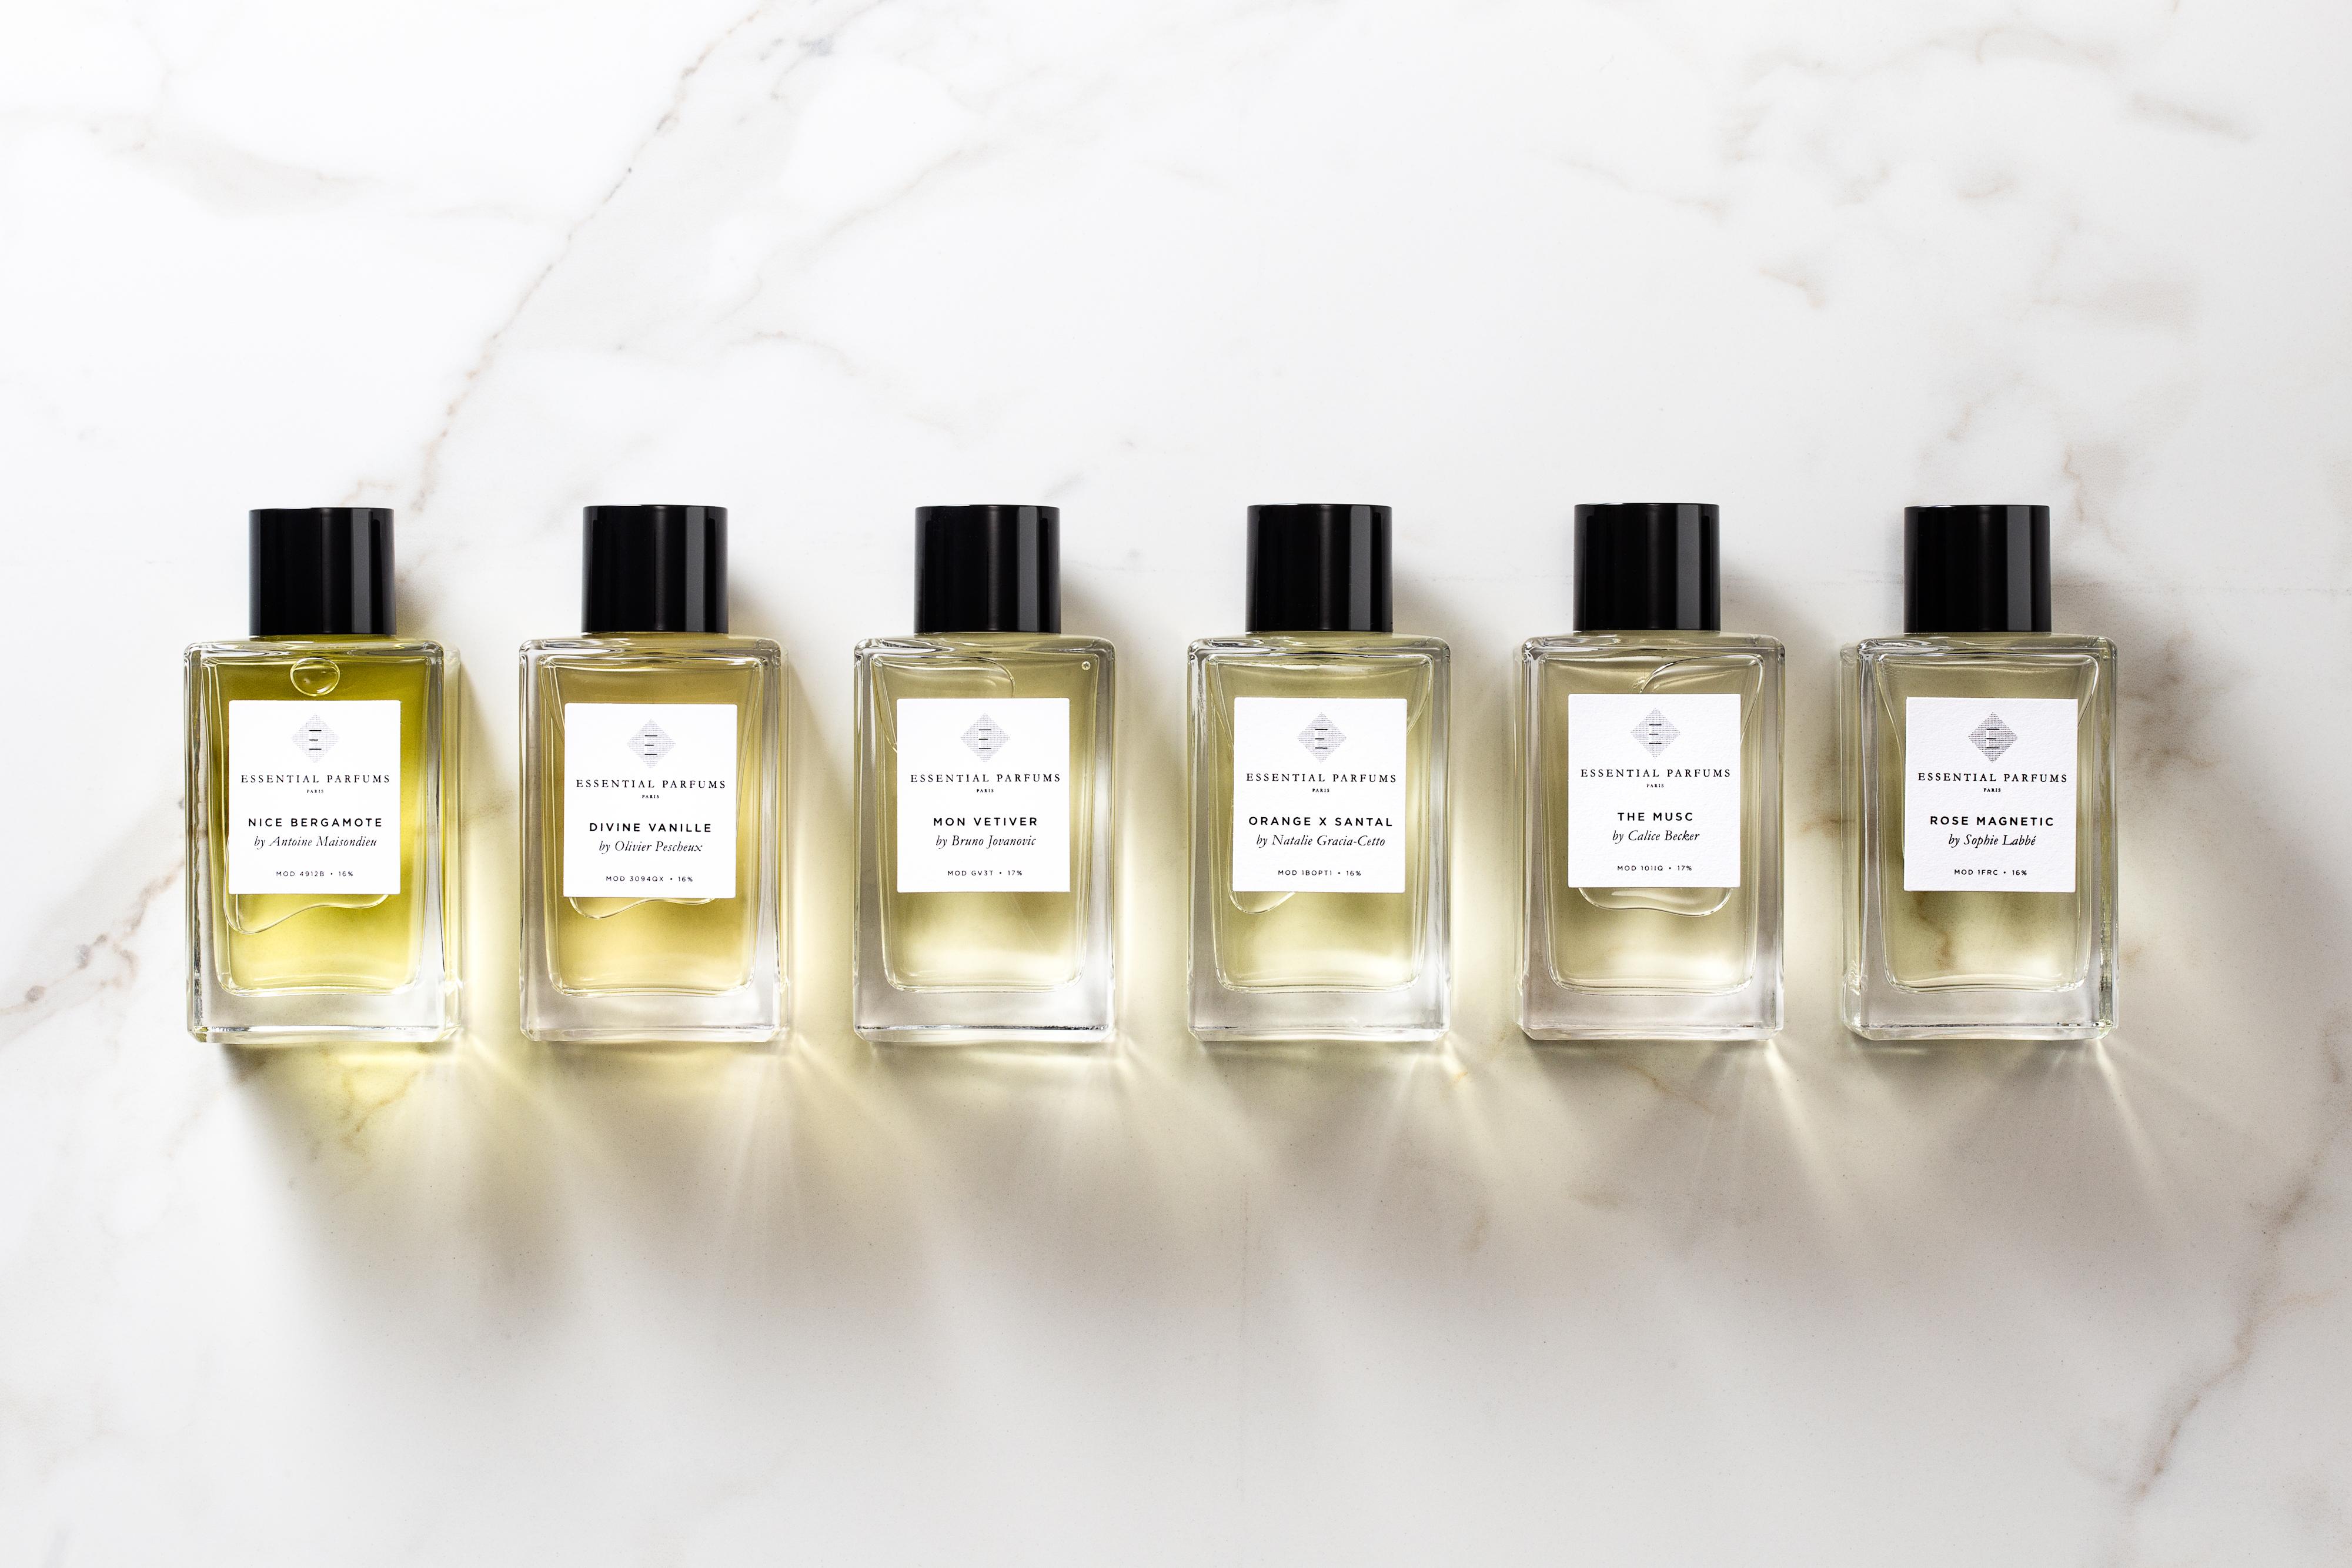 Šest důvodů proč tleskáme Essential Parfums